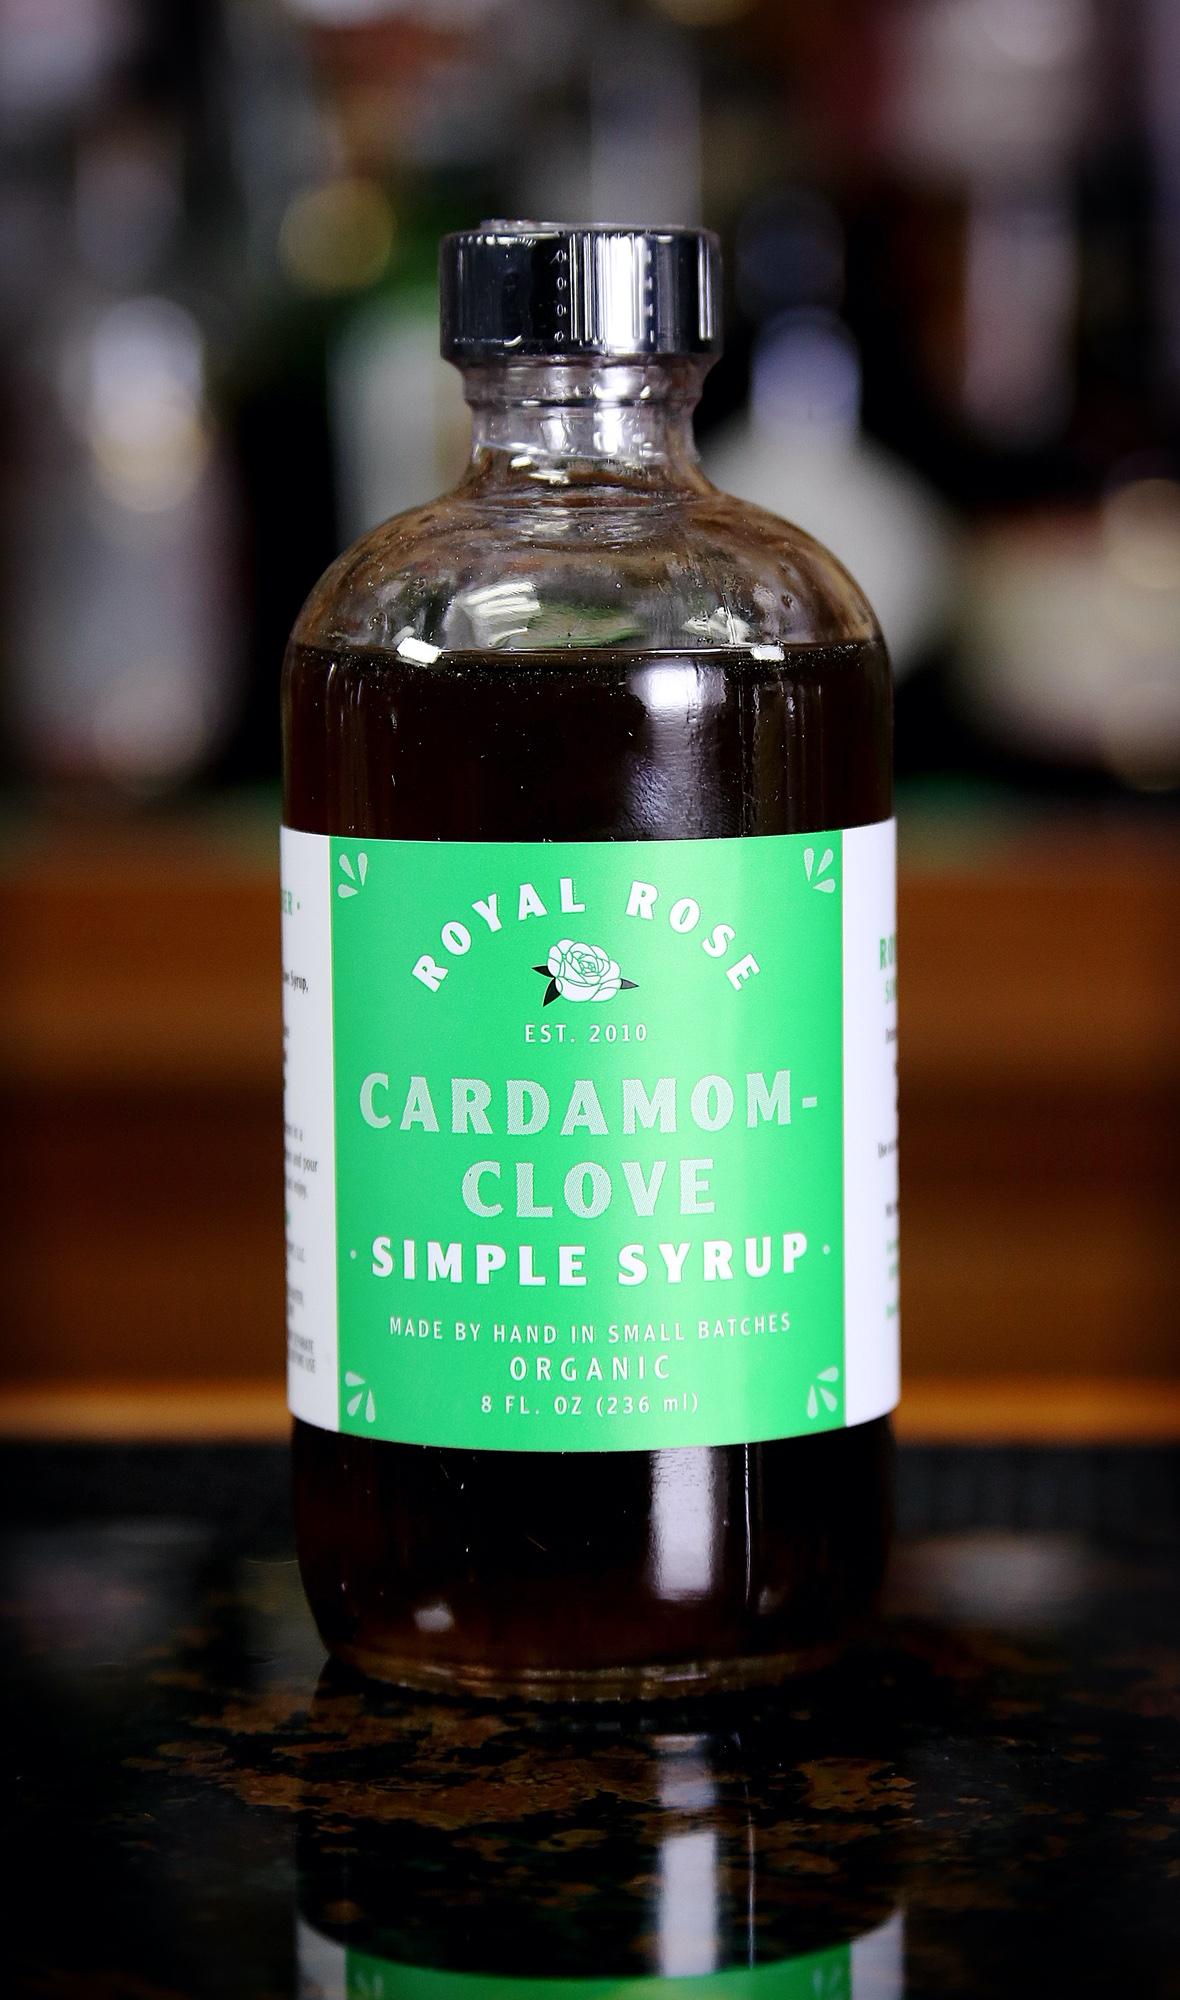 Royal Rose Cardamom Clove Simple Syrup